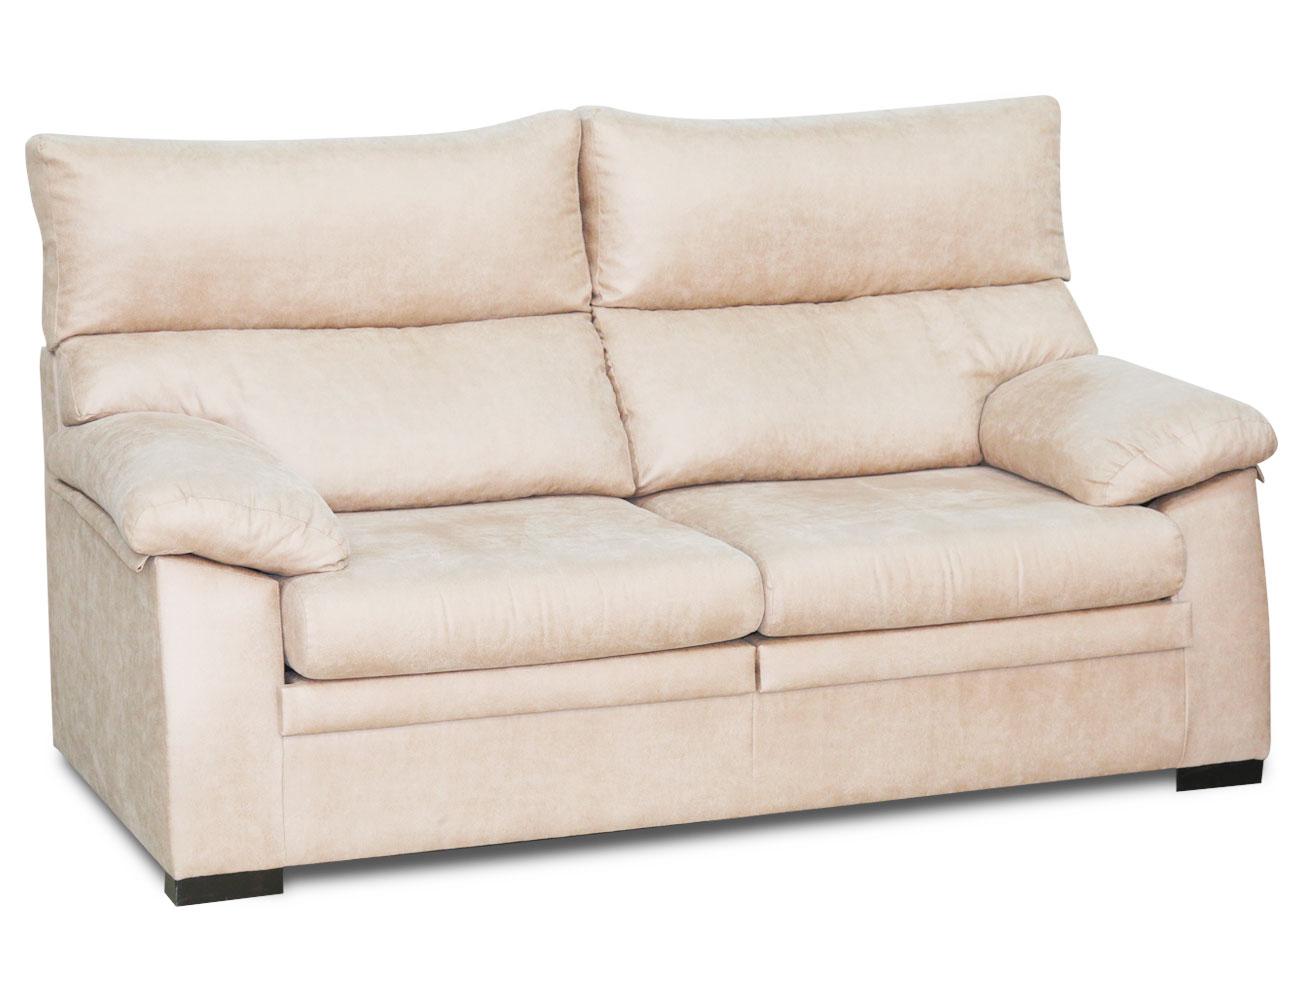 Sofa 3 plazas extraible surf blanco 2